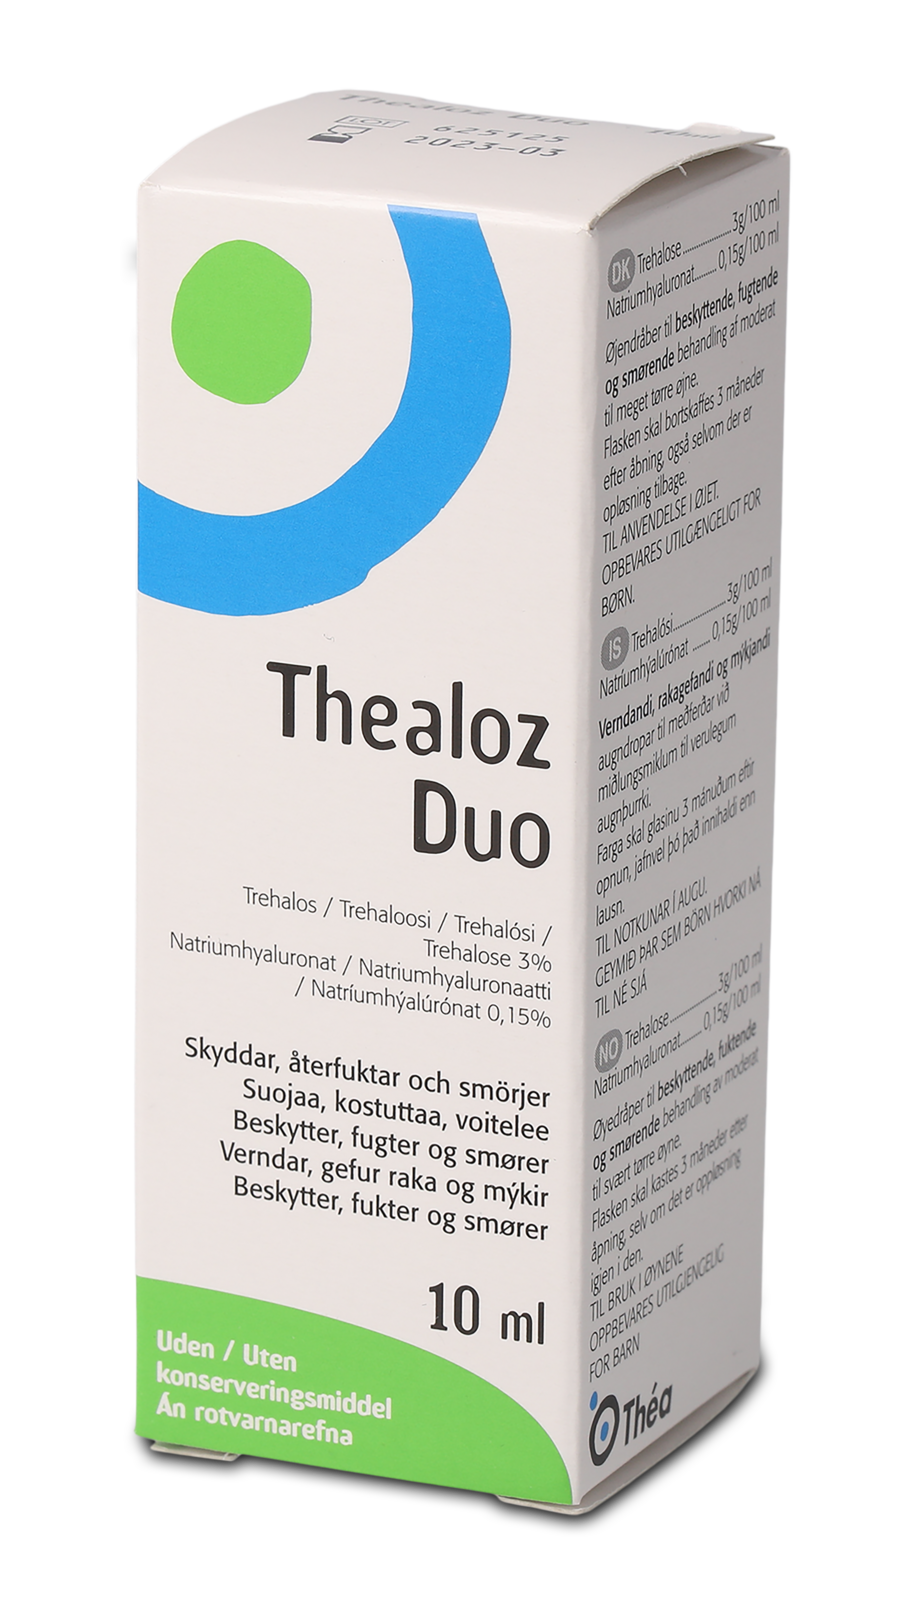 Angle_Left01 Thealoz Duo Thealoz Duo